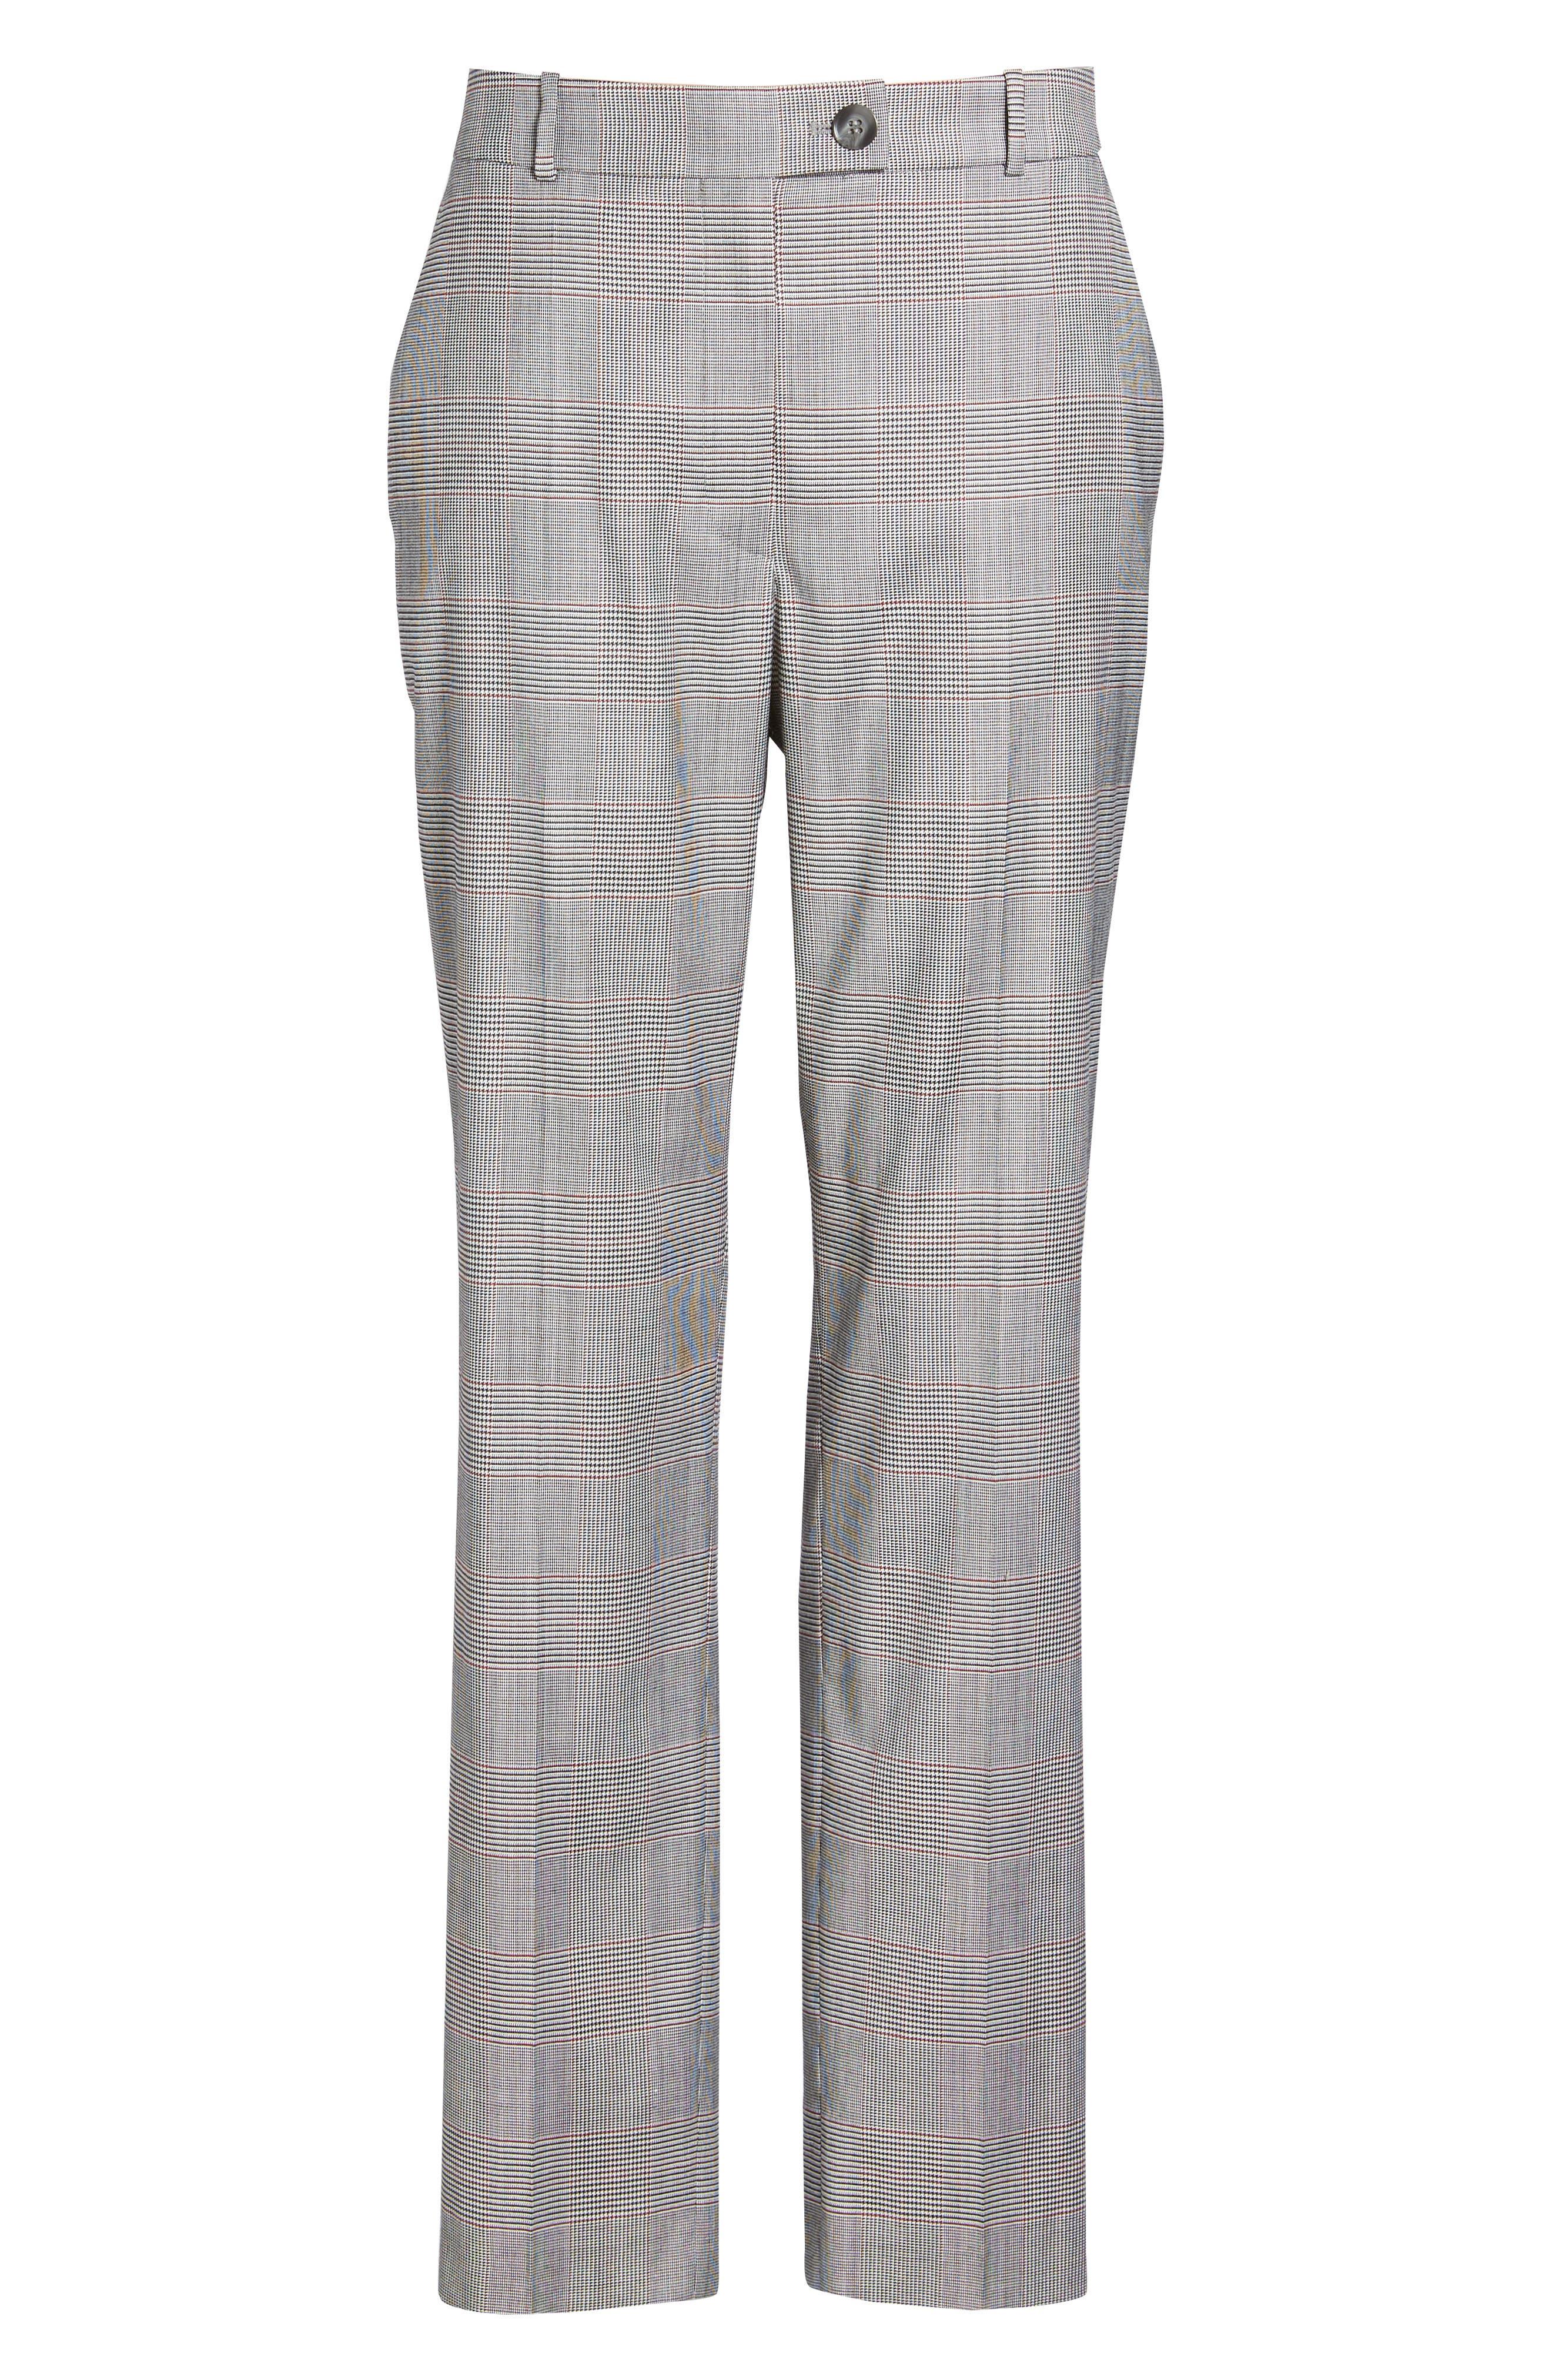 Tofilia Glencheck Slim Fit Trousers,                             Alternate thumbnail 7, color,                             Dark Sunset Orange Fantasy